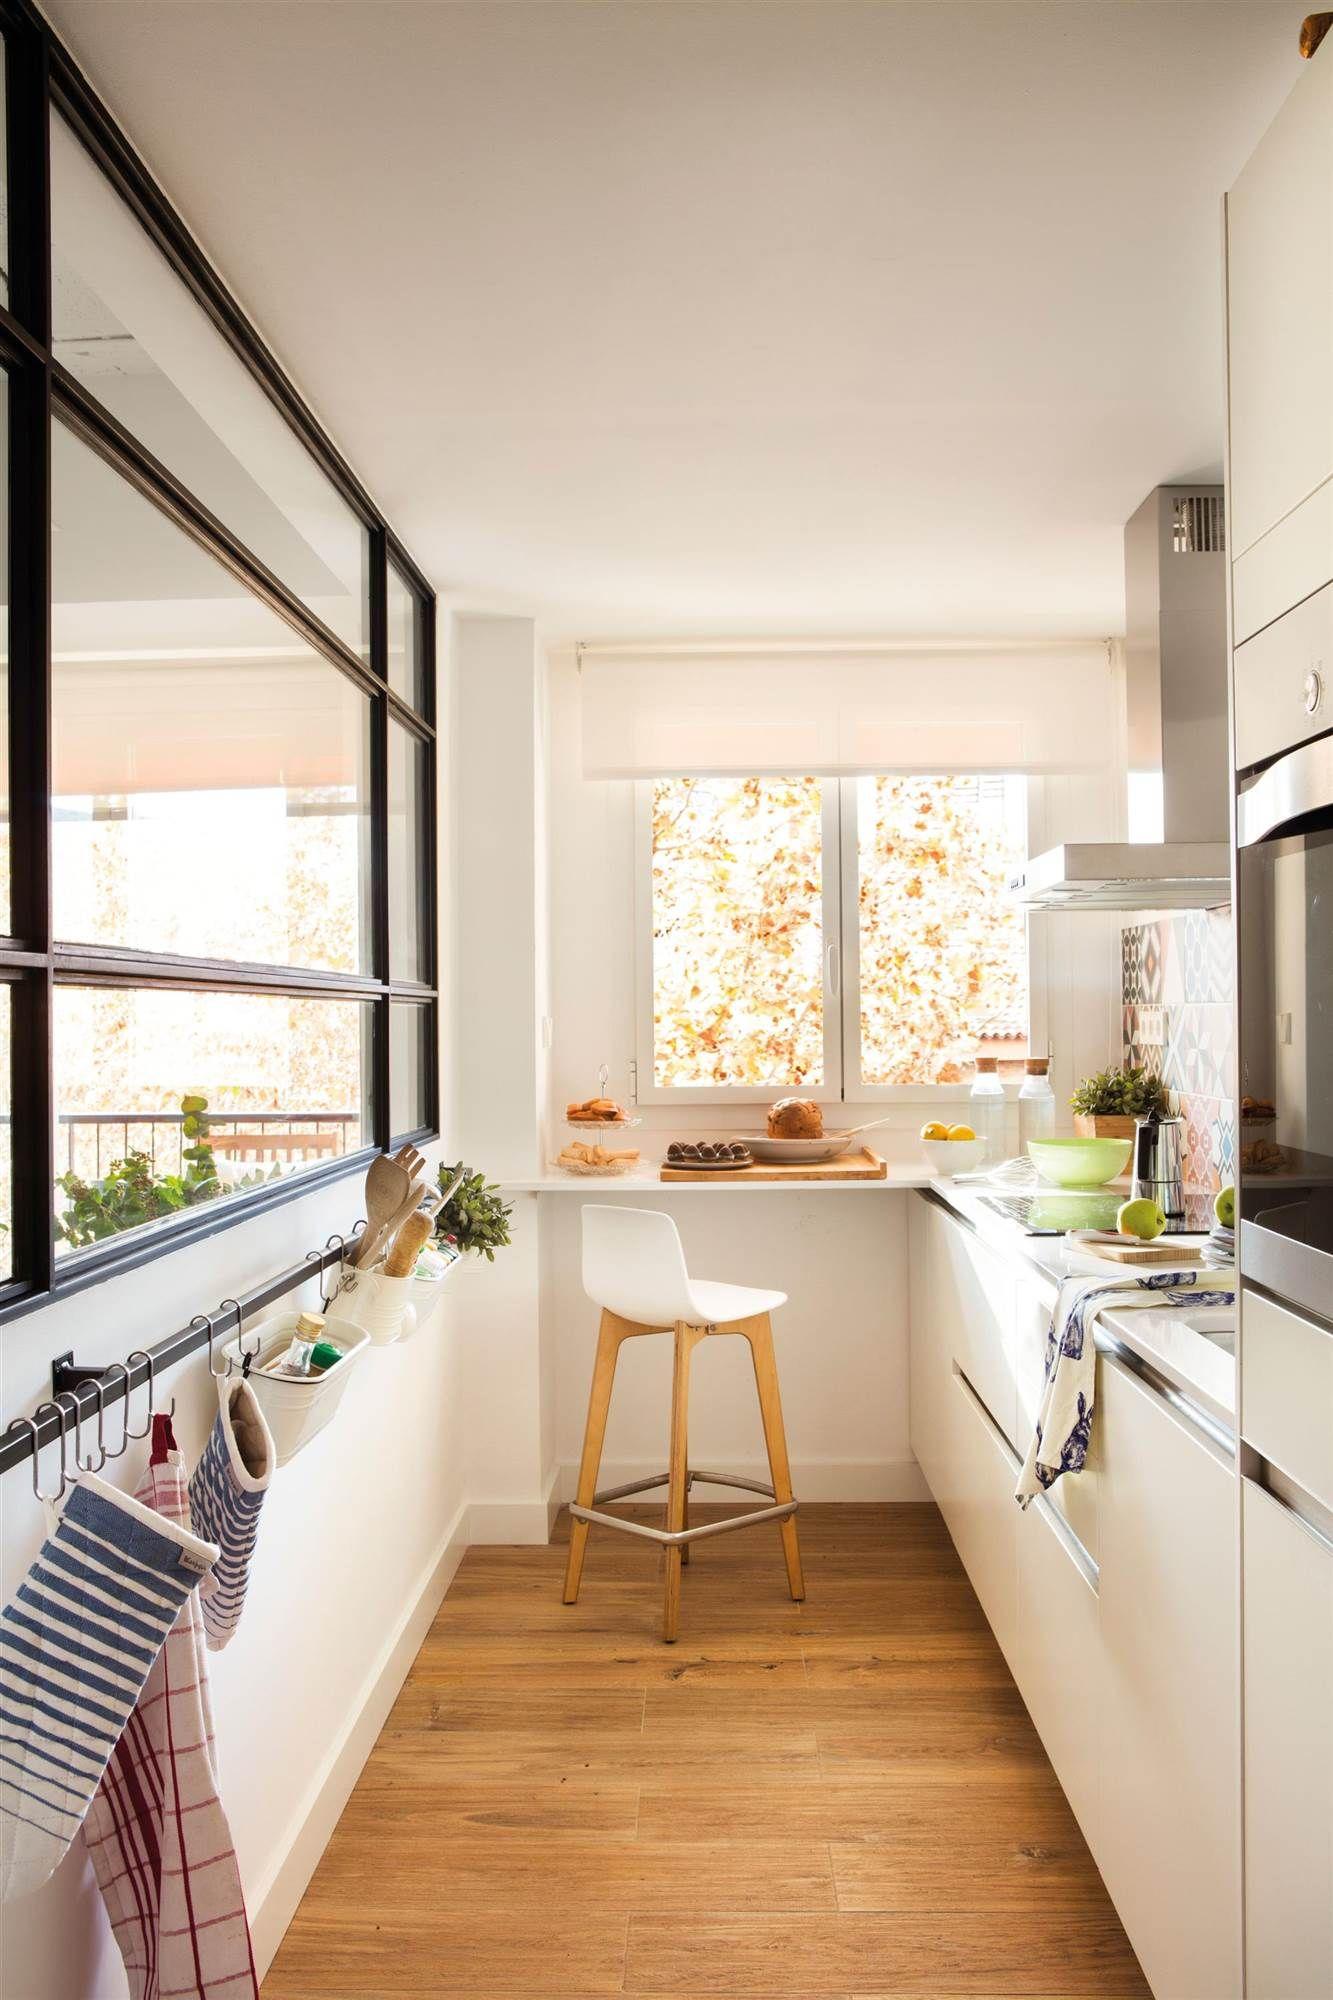 Cocina semiabierta con tabique de cristal 00442995 for Iluminar piso interior